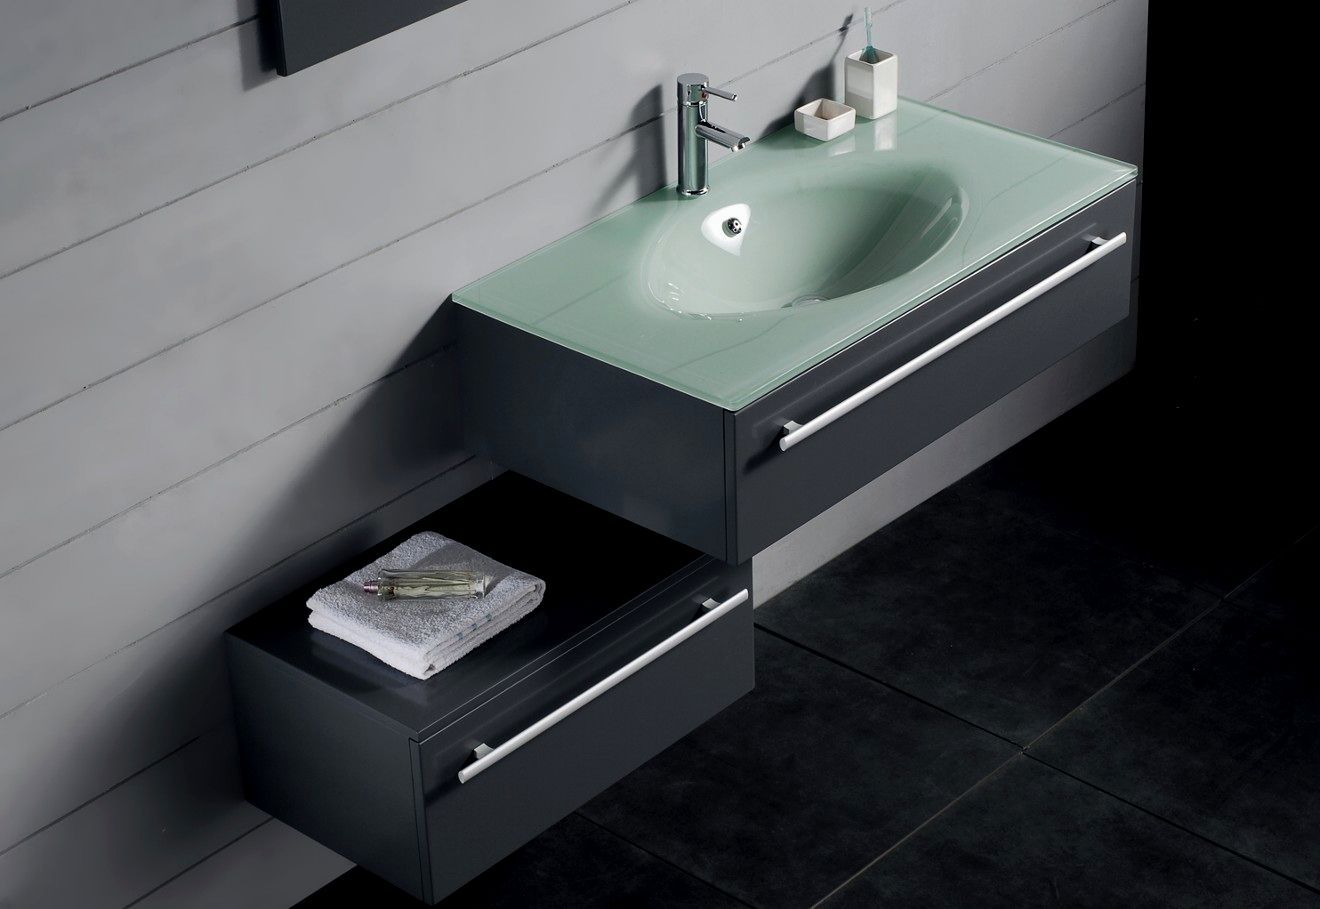 elegant bathroom vanity decor image-Inspirational Bathroom Vanity Decor Model